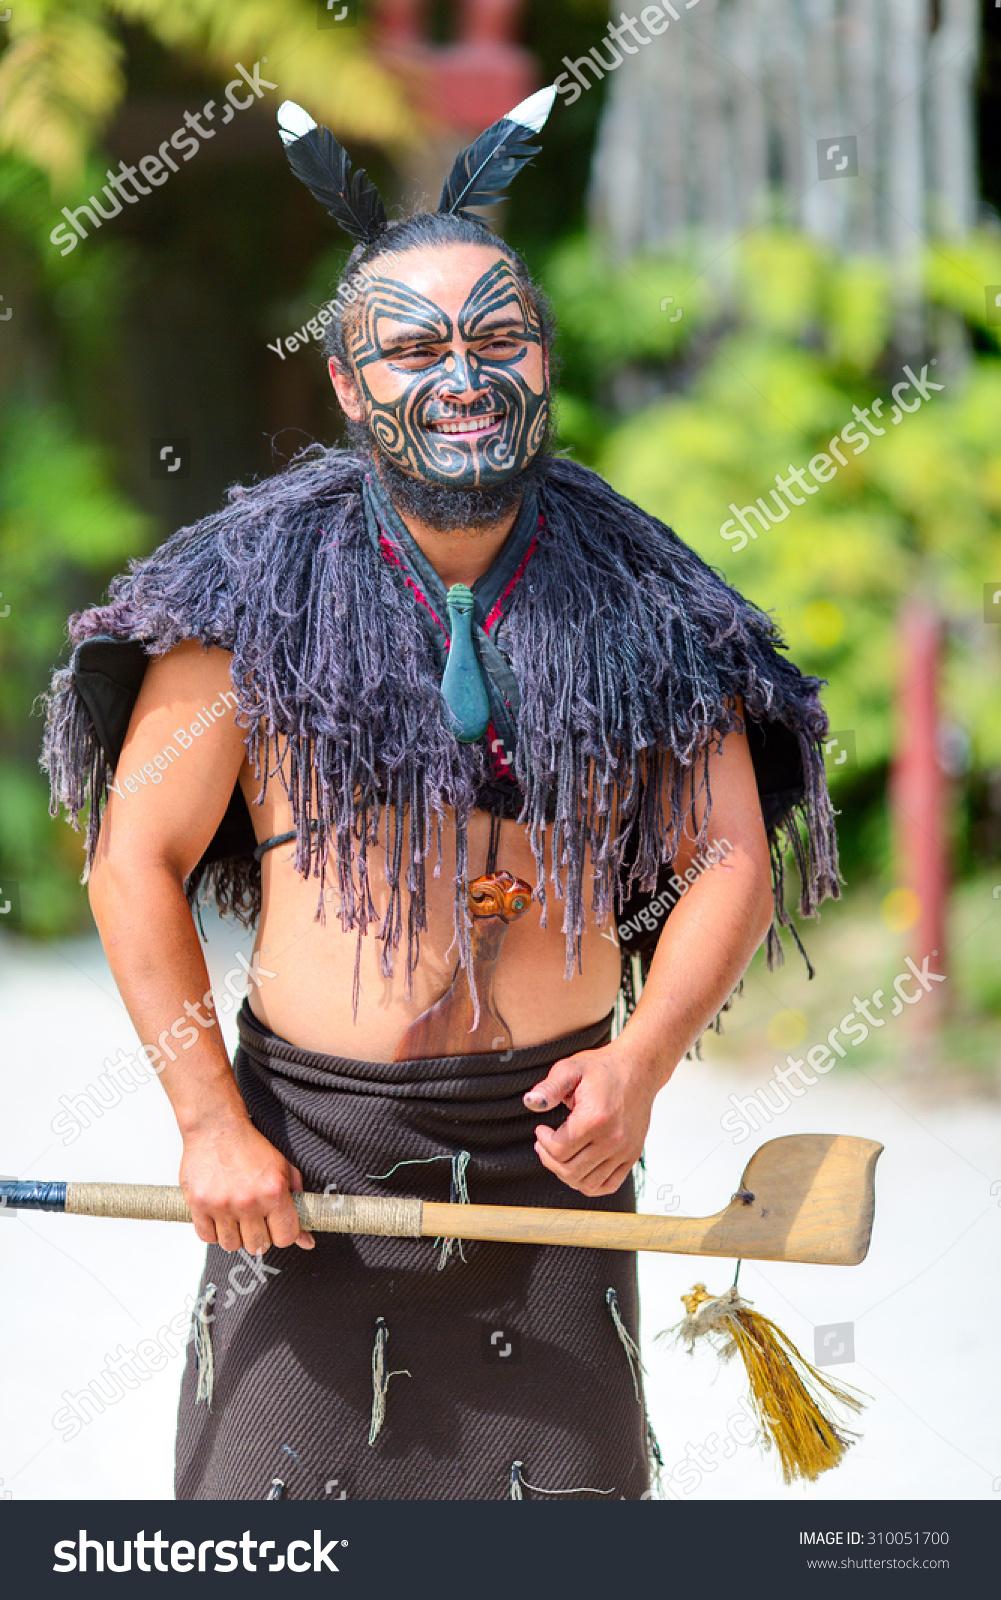 Maori Greeting New Zealand: 30 January 2015: Maori Tribes